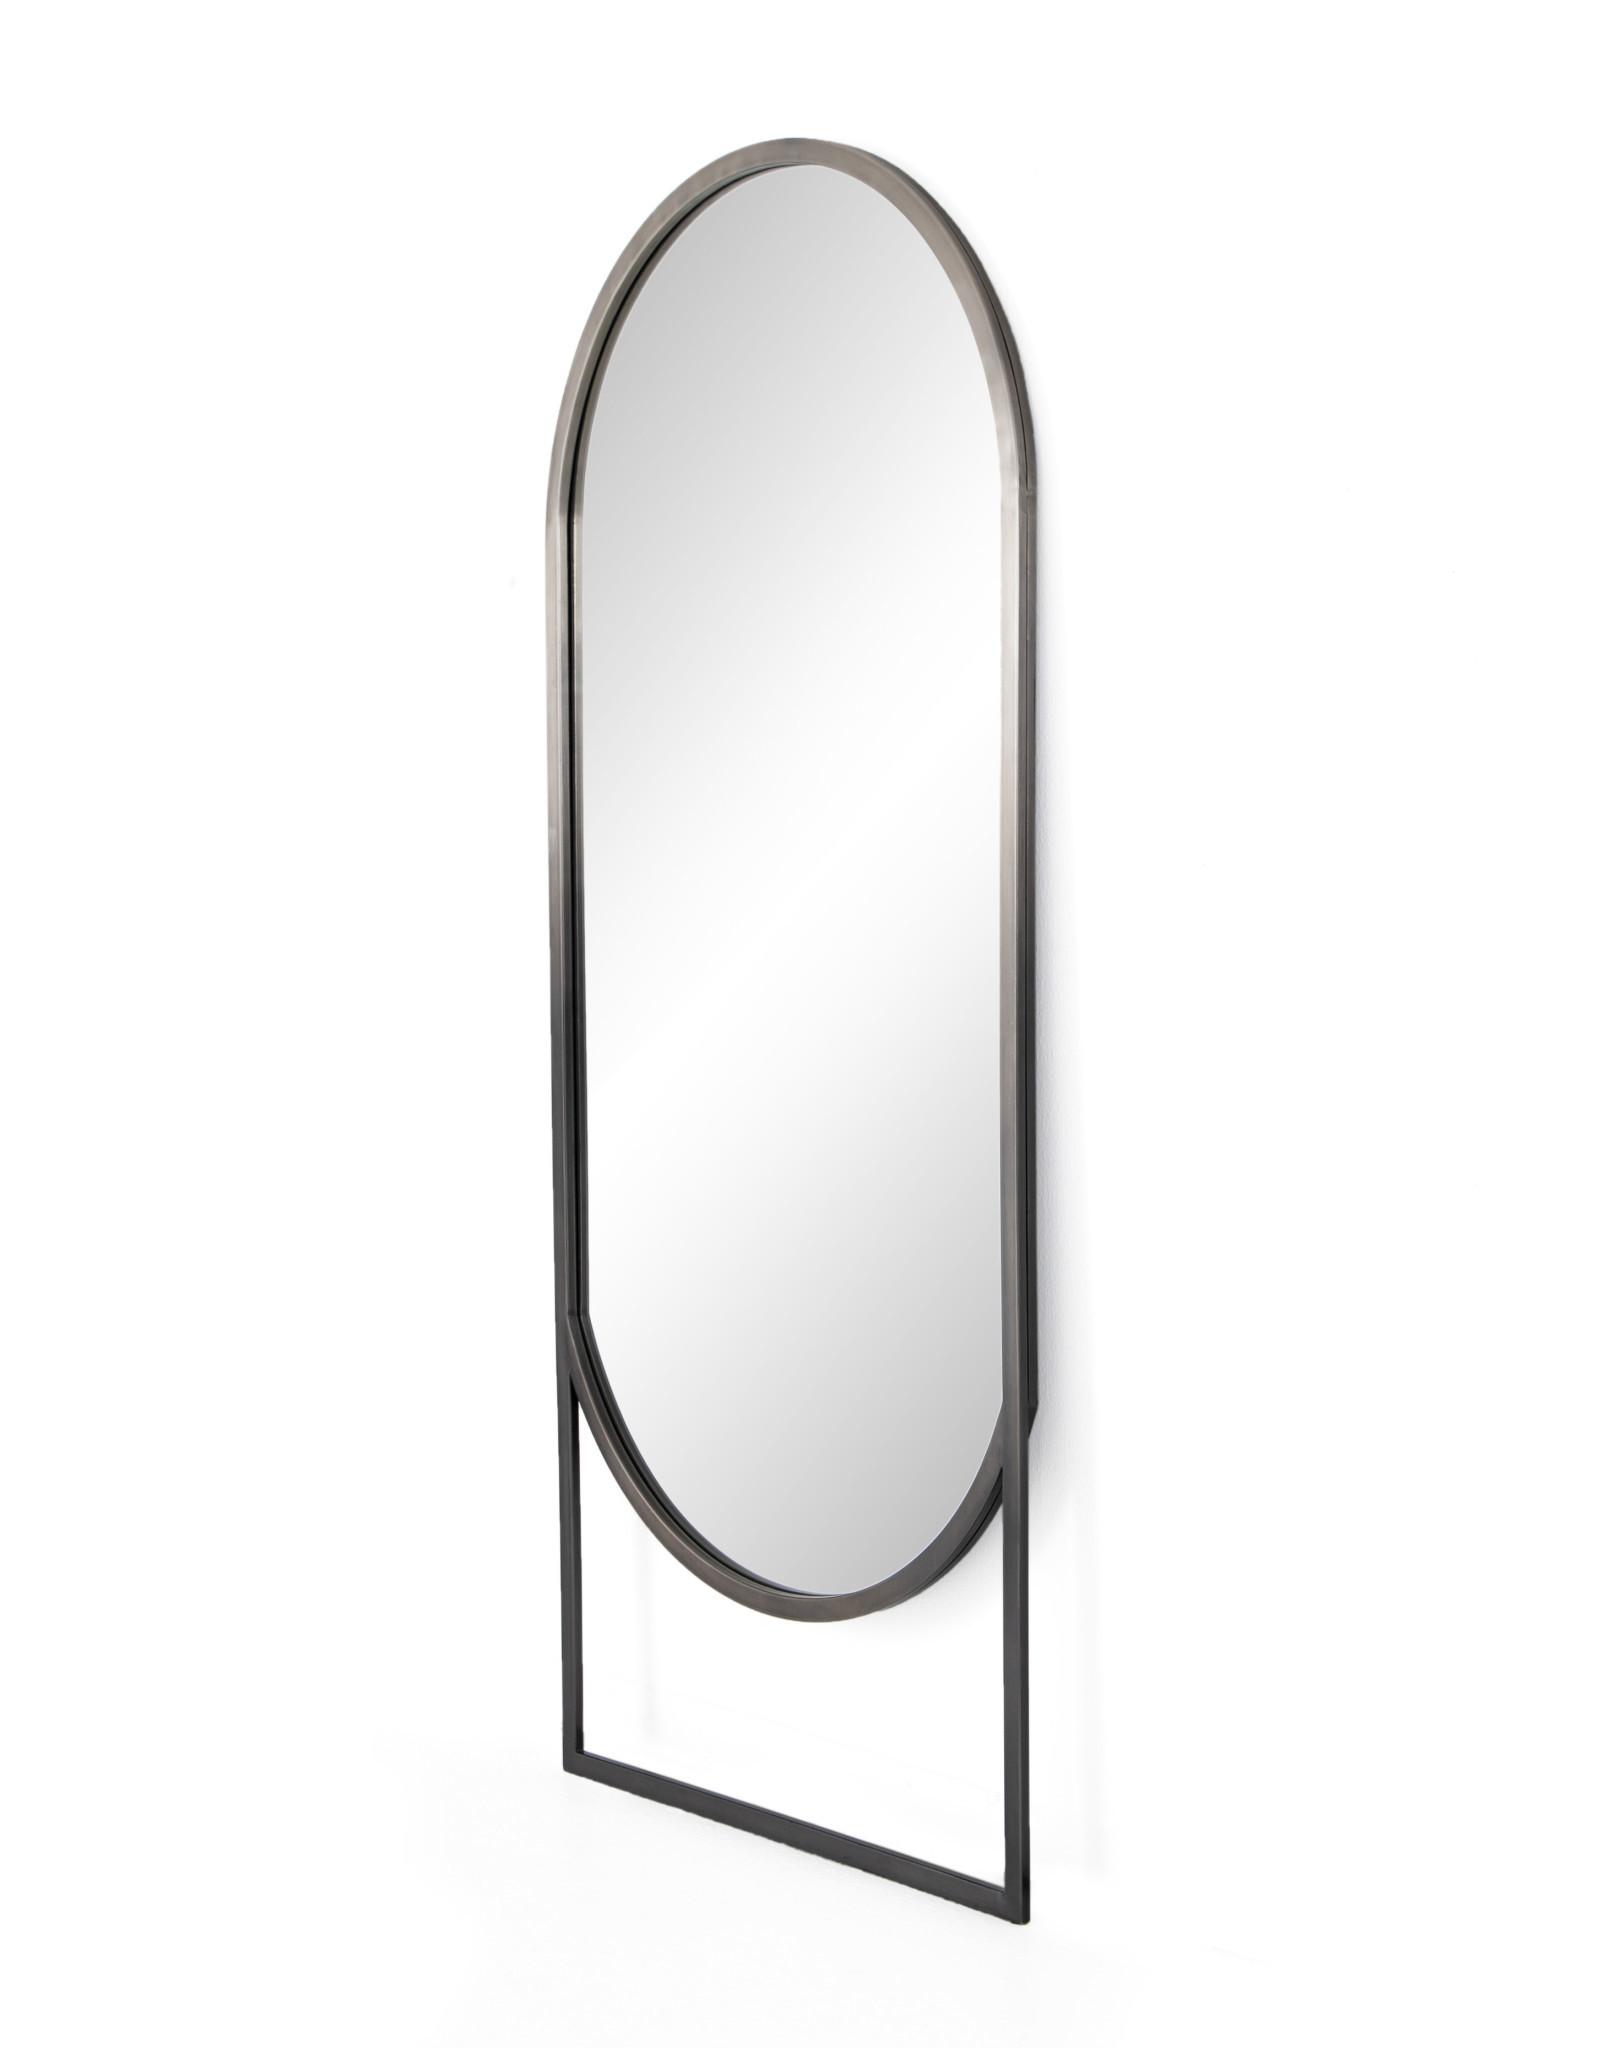 Dawson Floor Mirror - Ombre Pewter